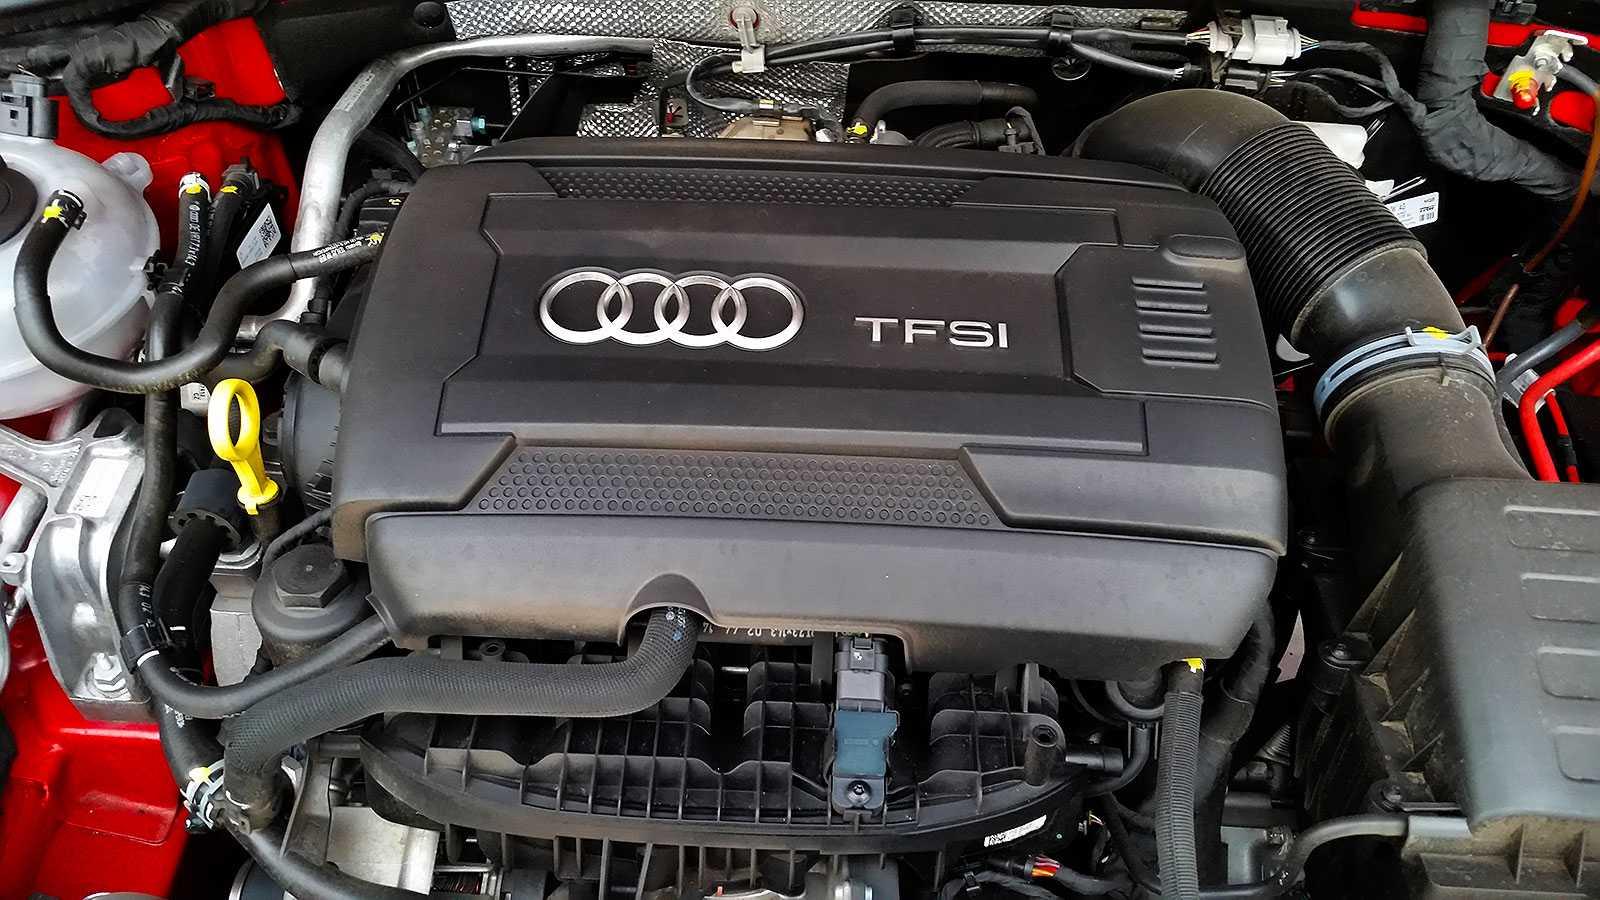 Audi TT 2.0 TFSi 230 CV Stronic Coupé 2015 Test Drive Rutamotor (26)